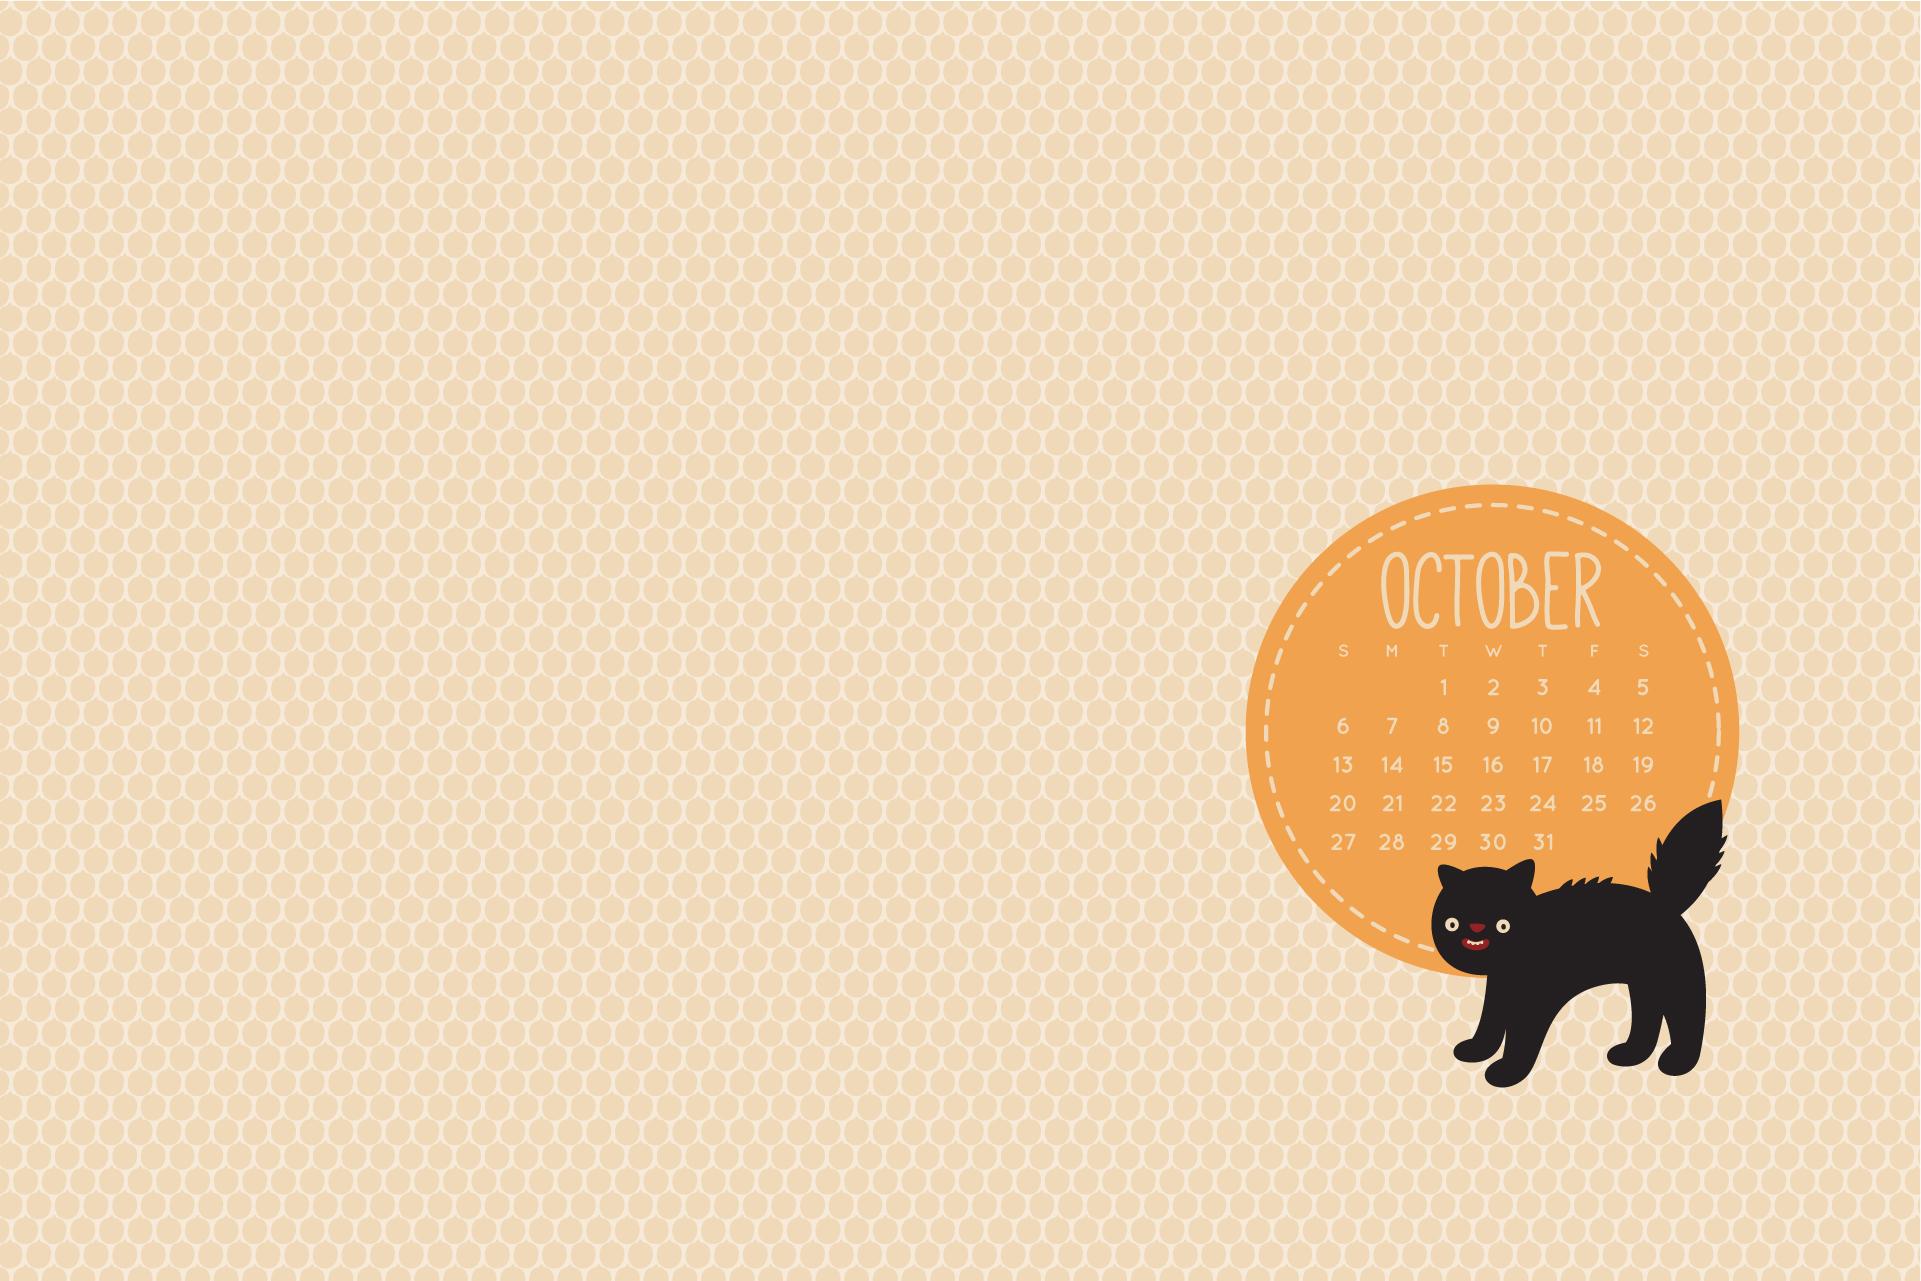 gallery for gt cute october 2013 calendar wallpaper